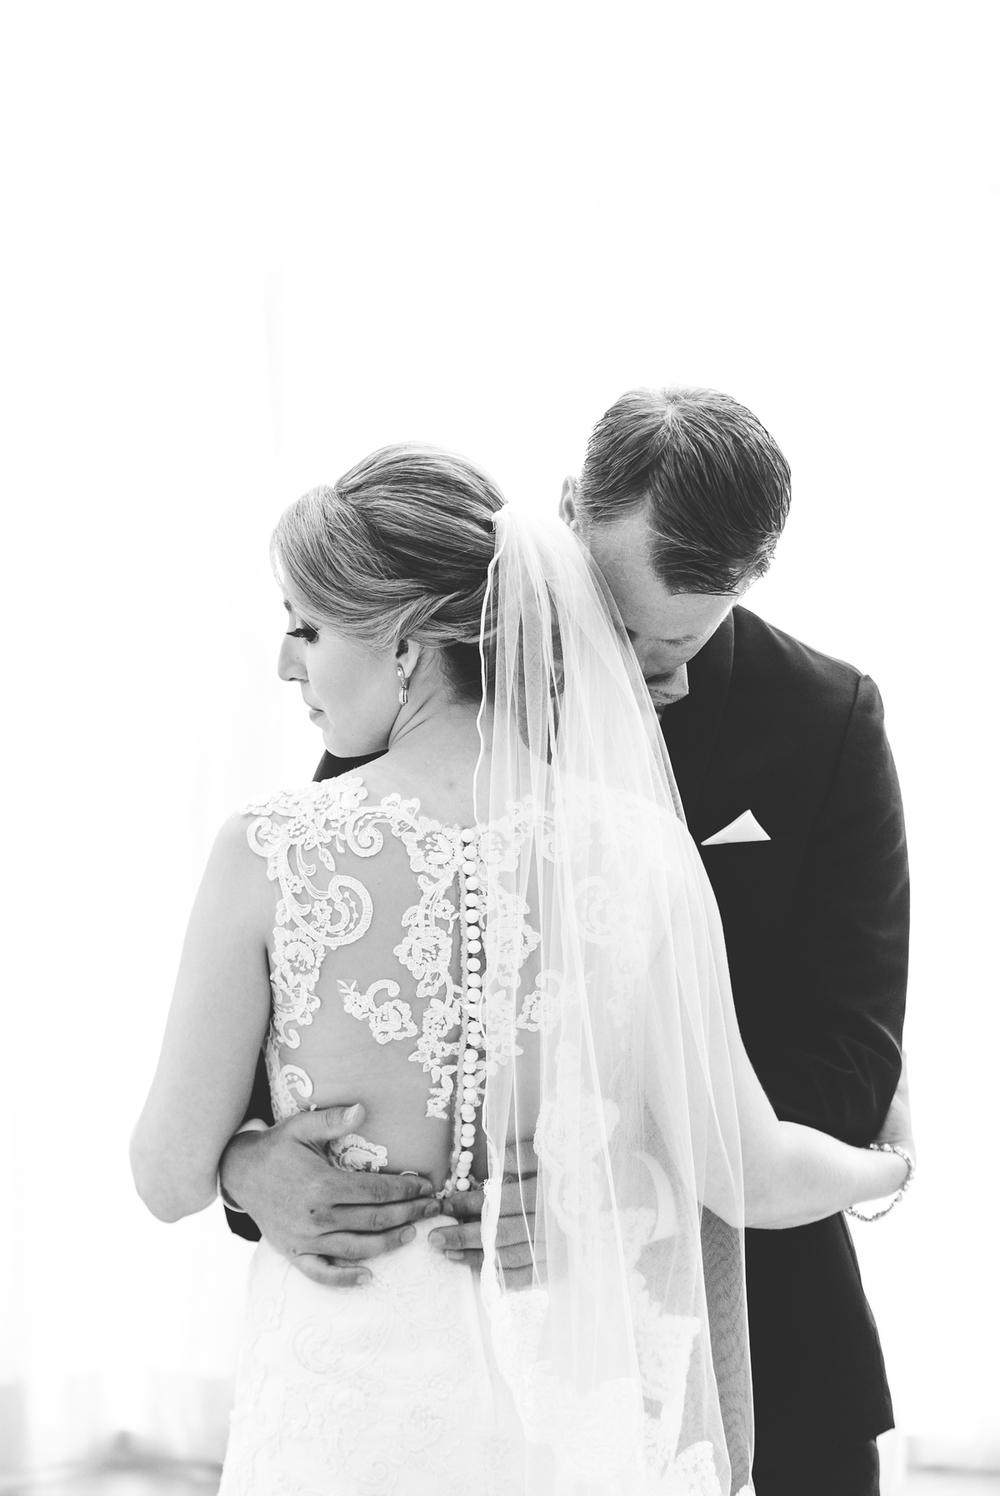 Ft-Lauderdale-Wedding-Photographer-Signature-Grand-Gatsby-Sonju28.jpg